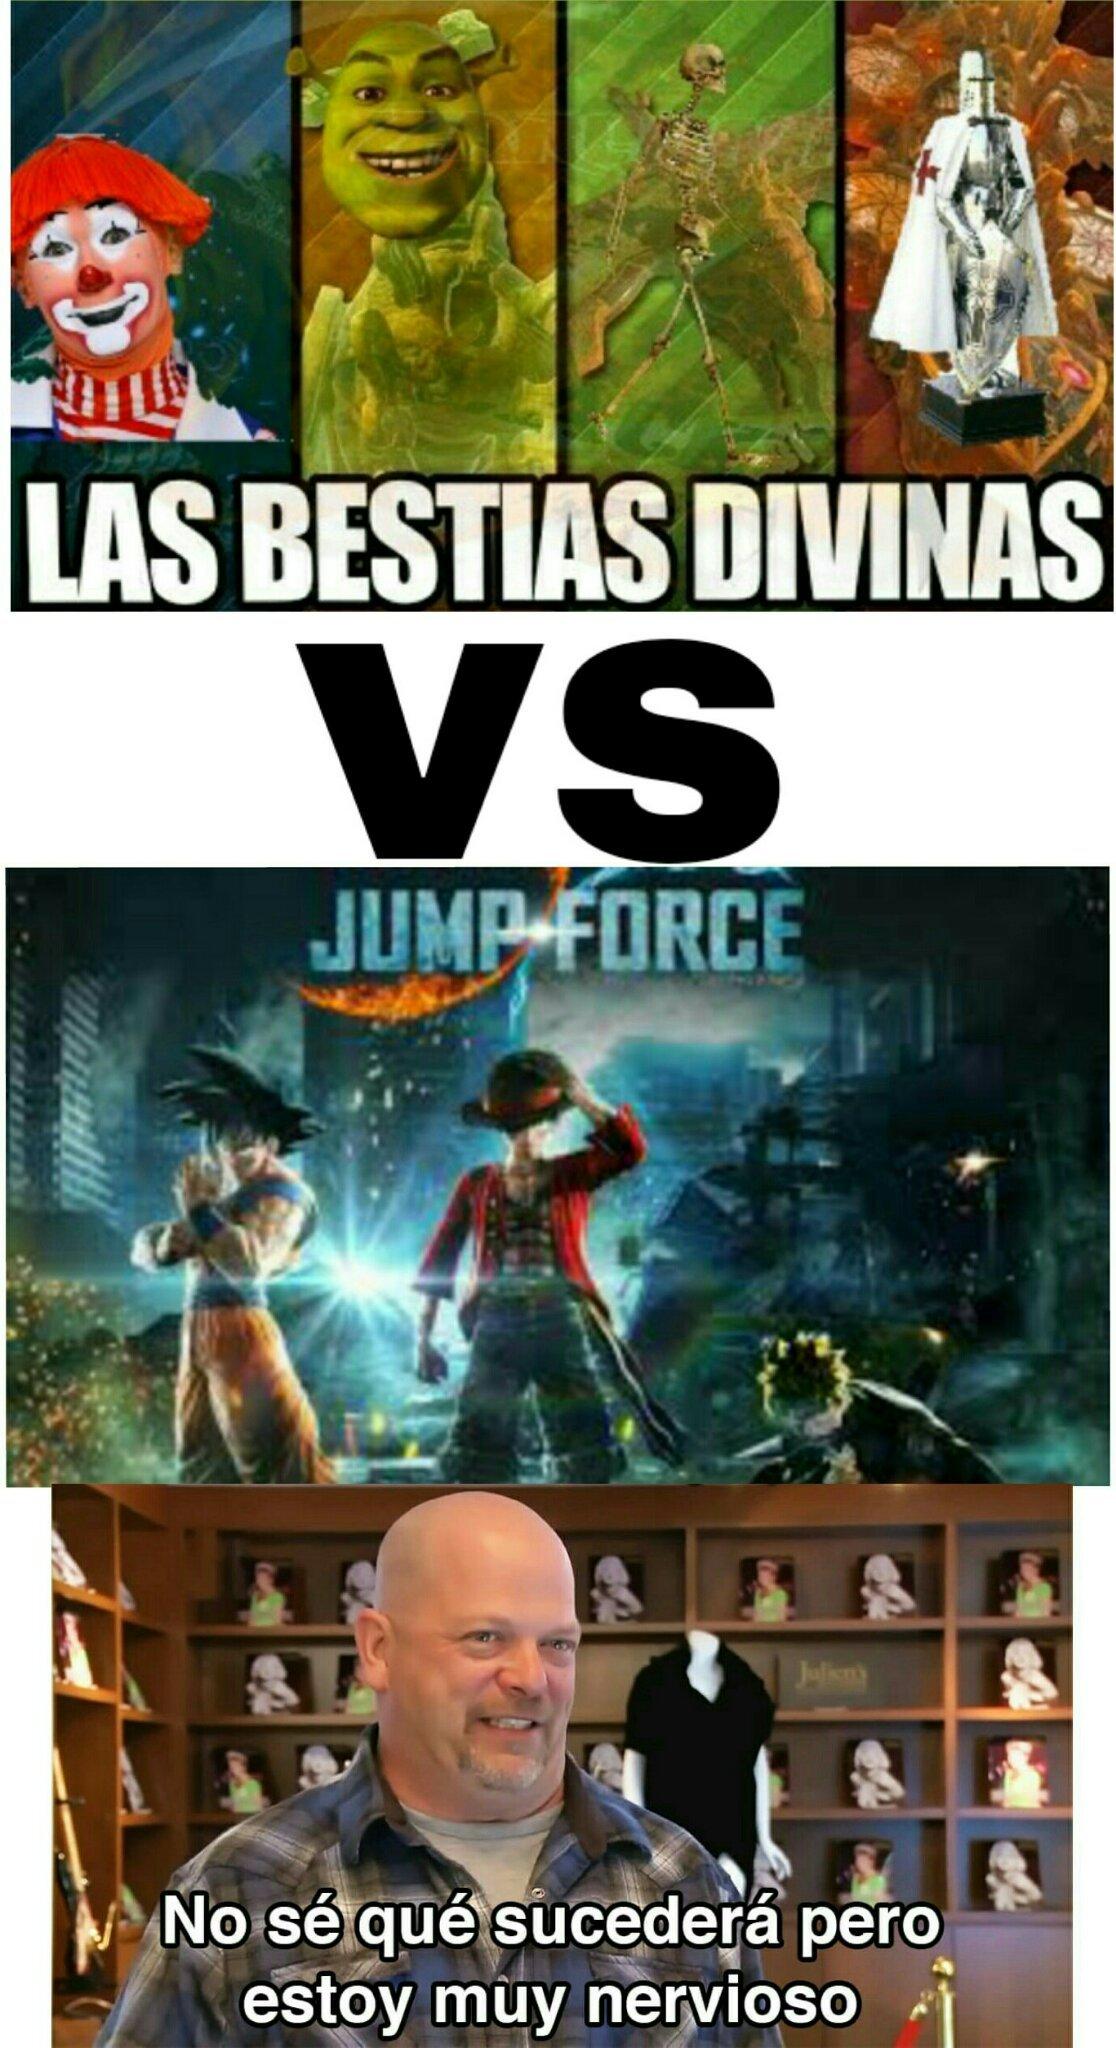 Jump force - meme